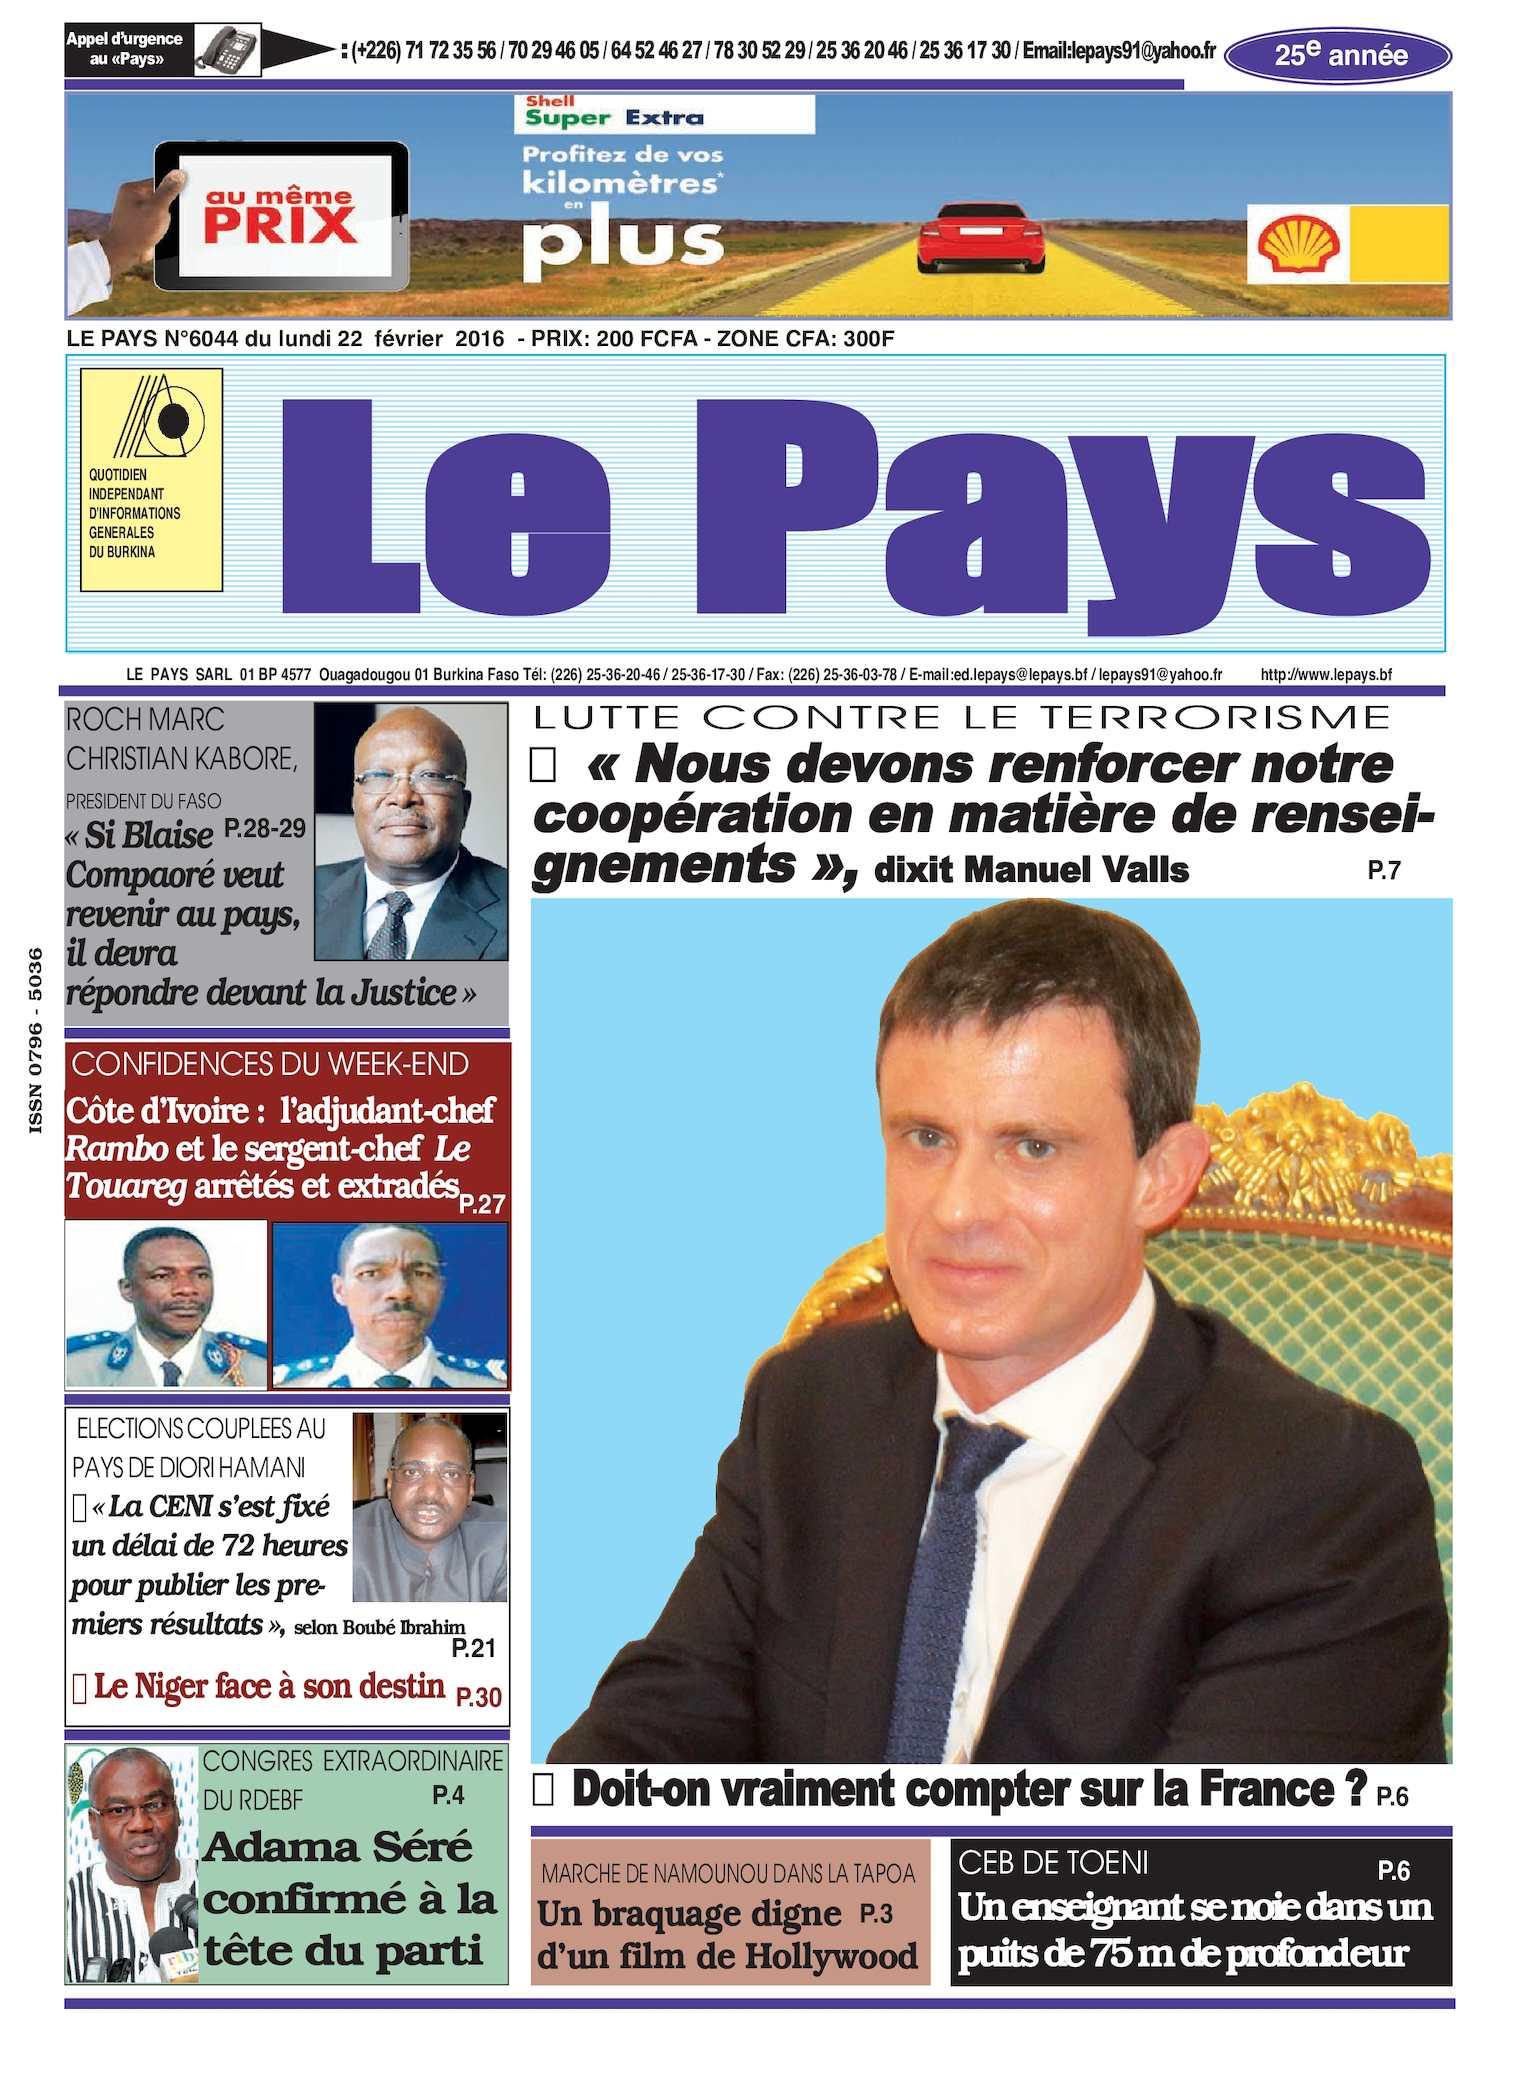 Escort grosse poitrine Ouagadougou Burkina Faso